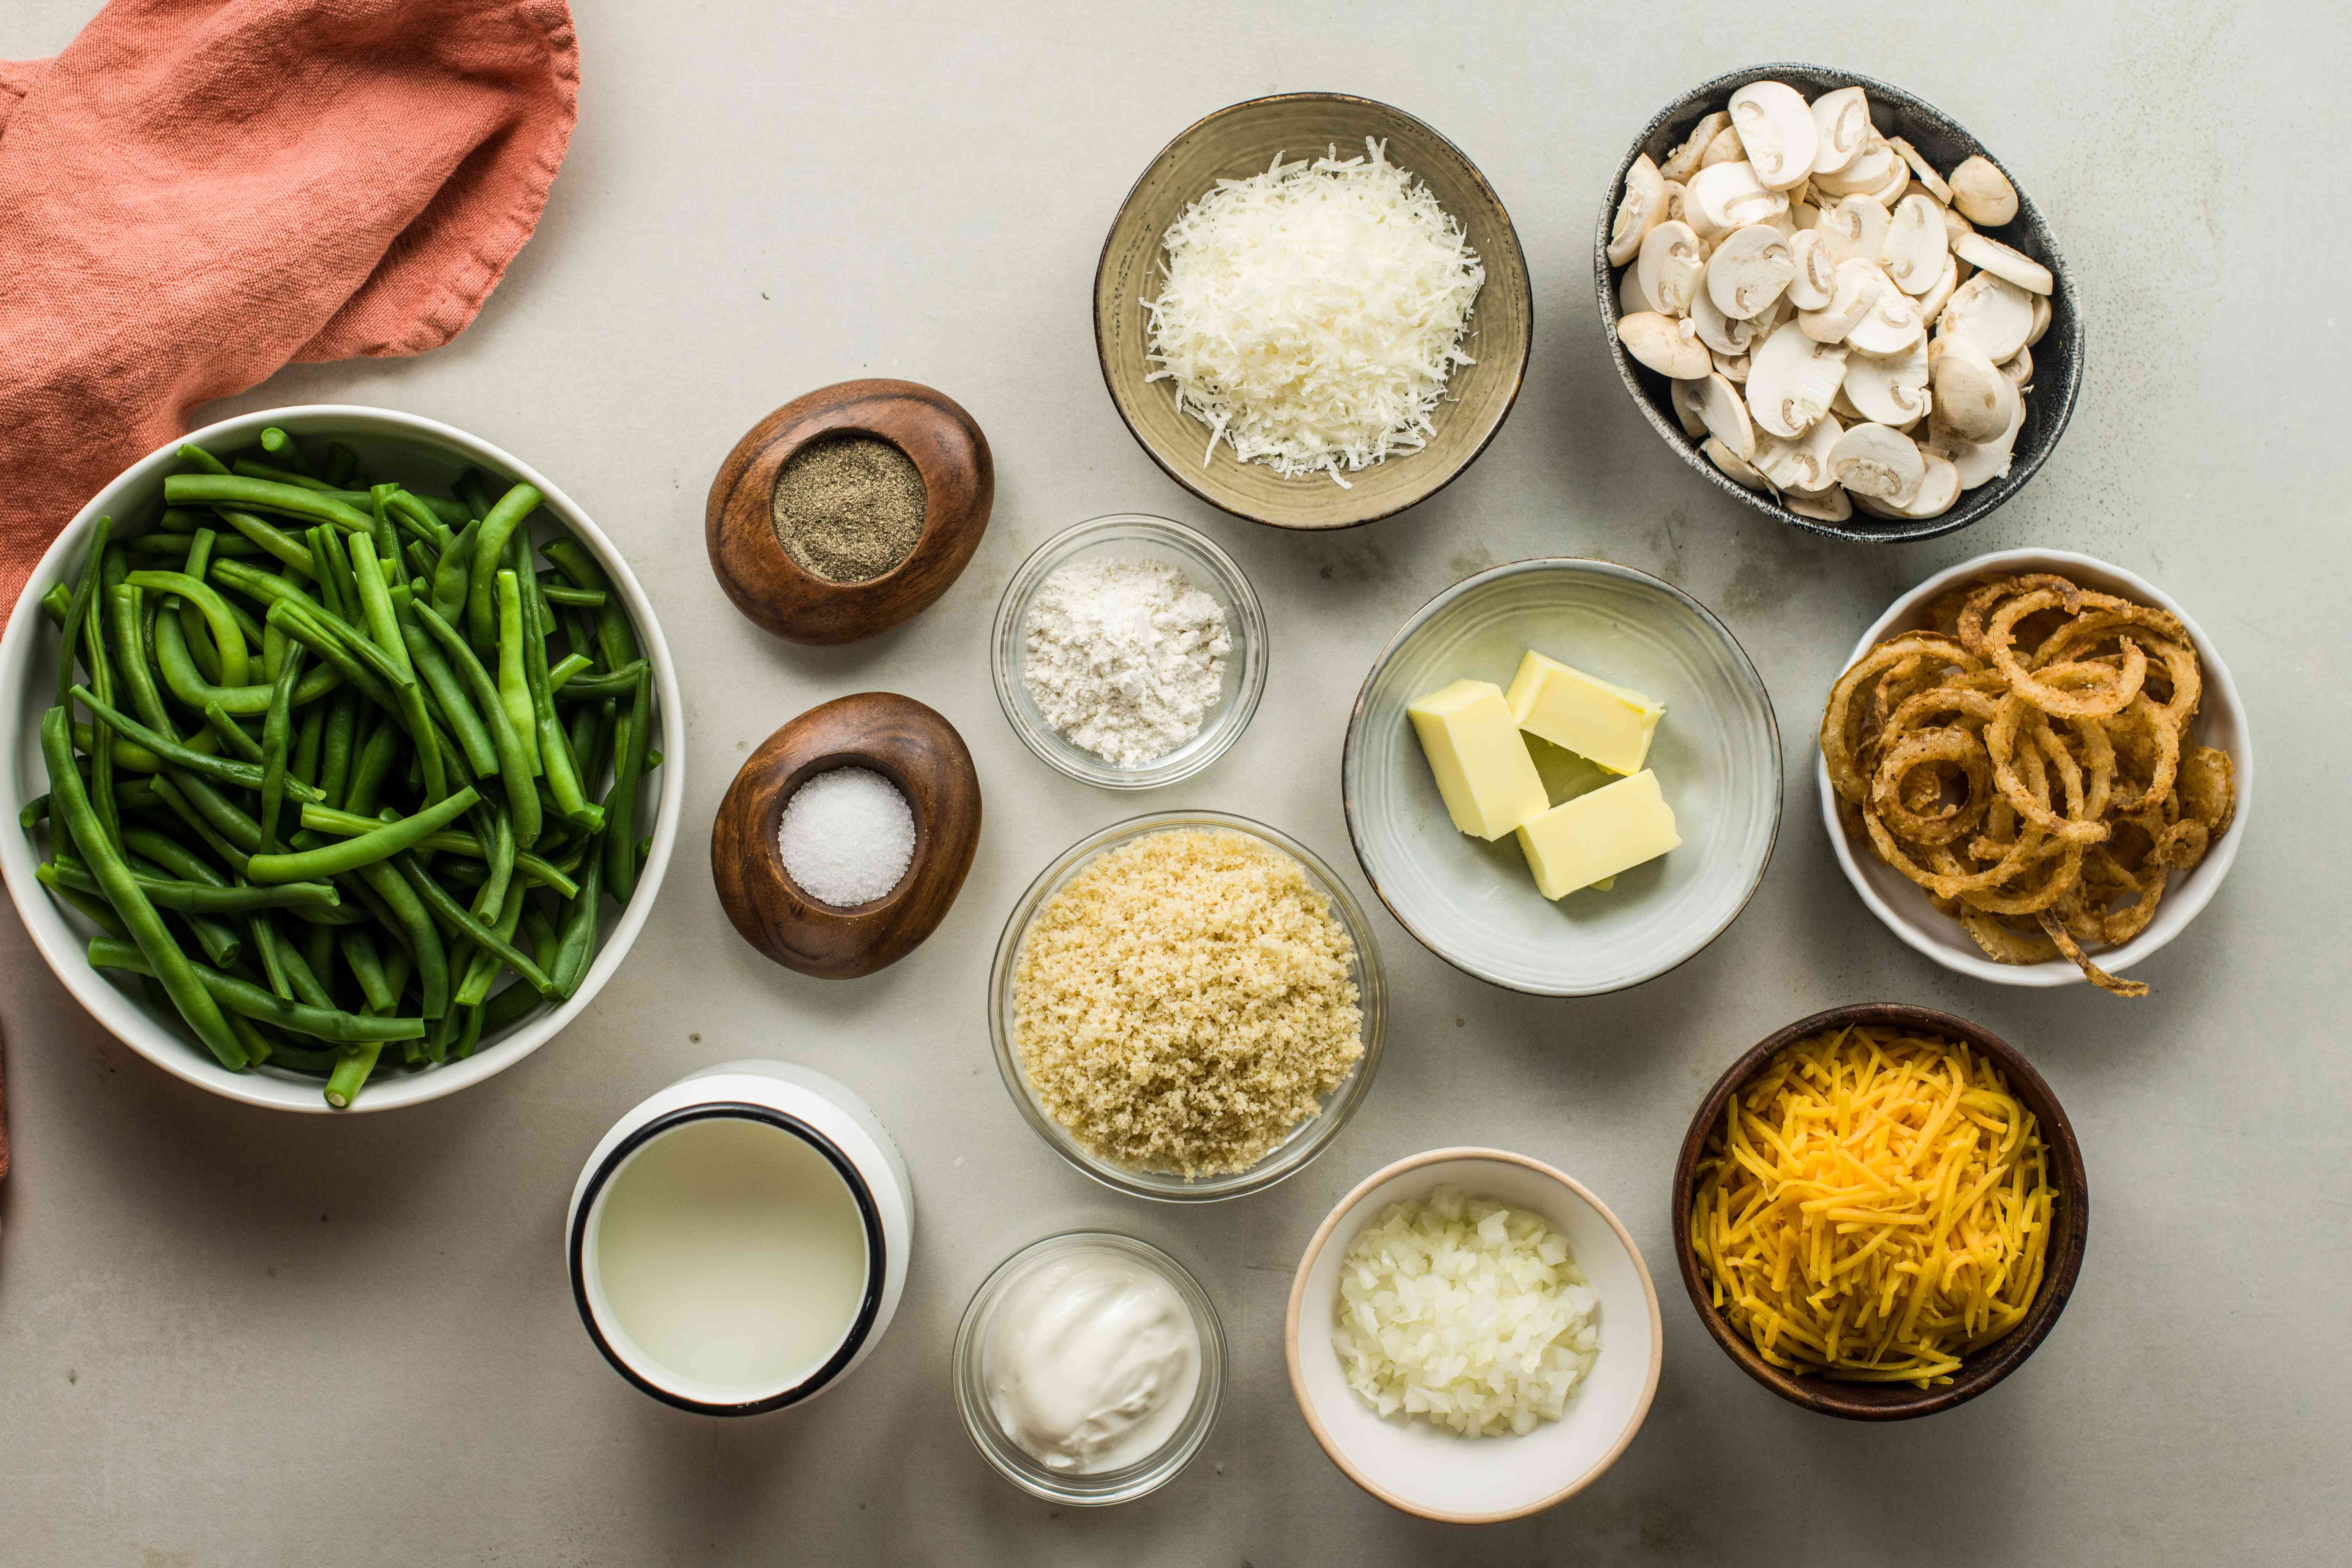 Southern green bean casserole ingredients